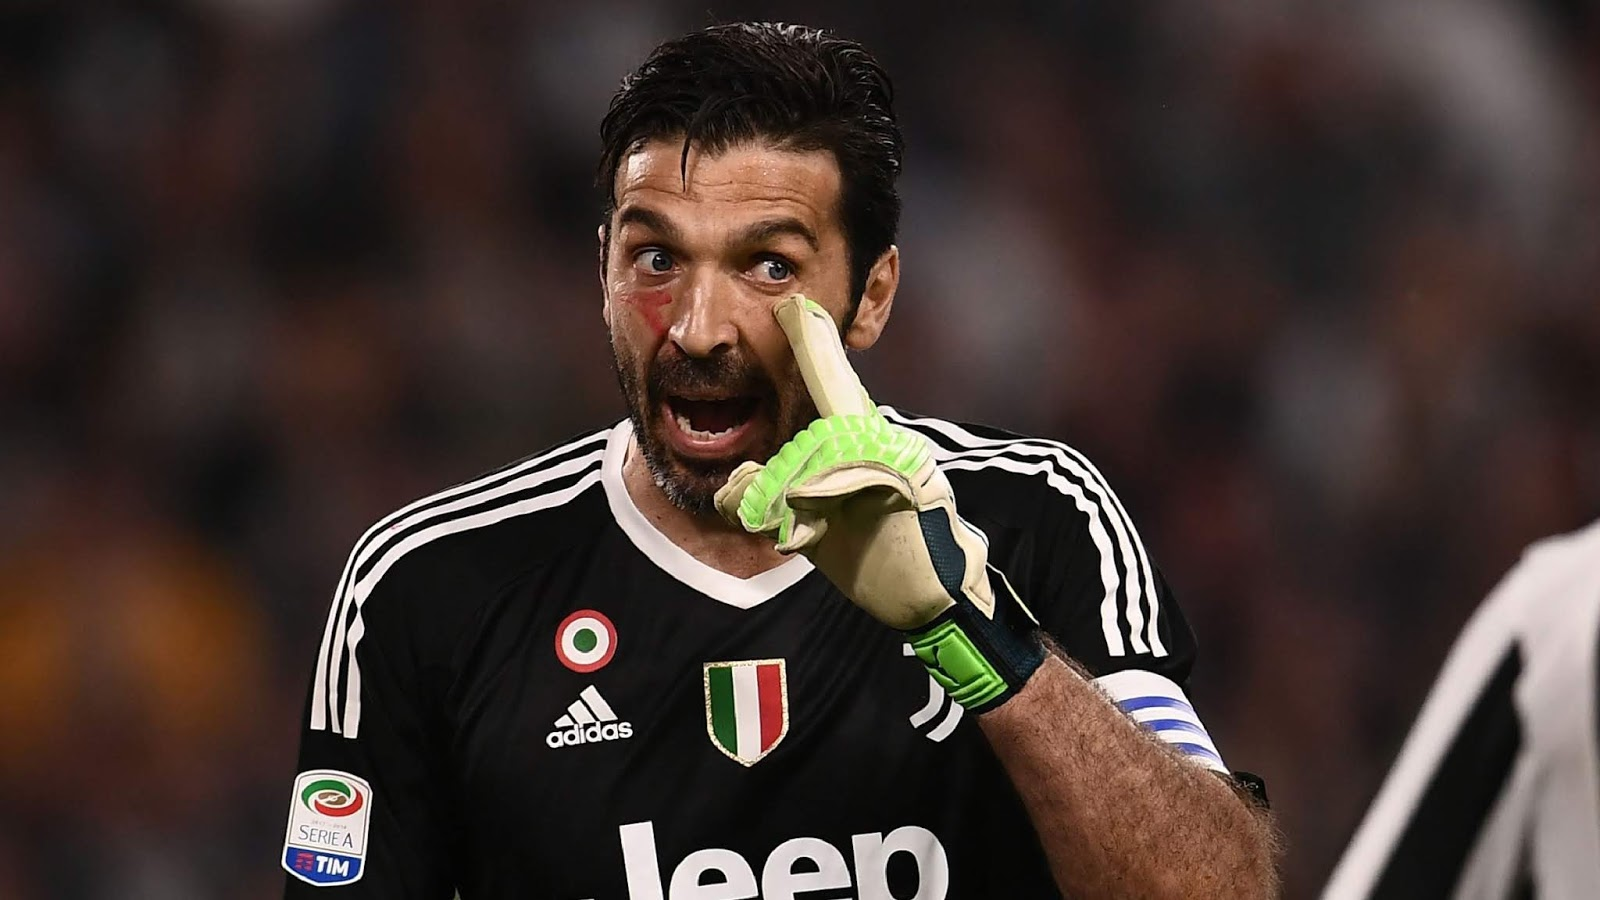 Polifocus Blog Juventus Goalie Buffon Banned Over Referee Comments Polifocus